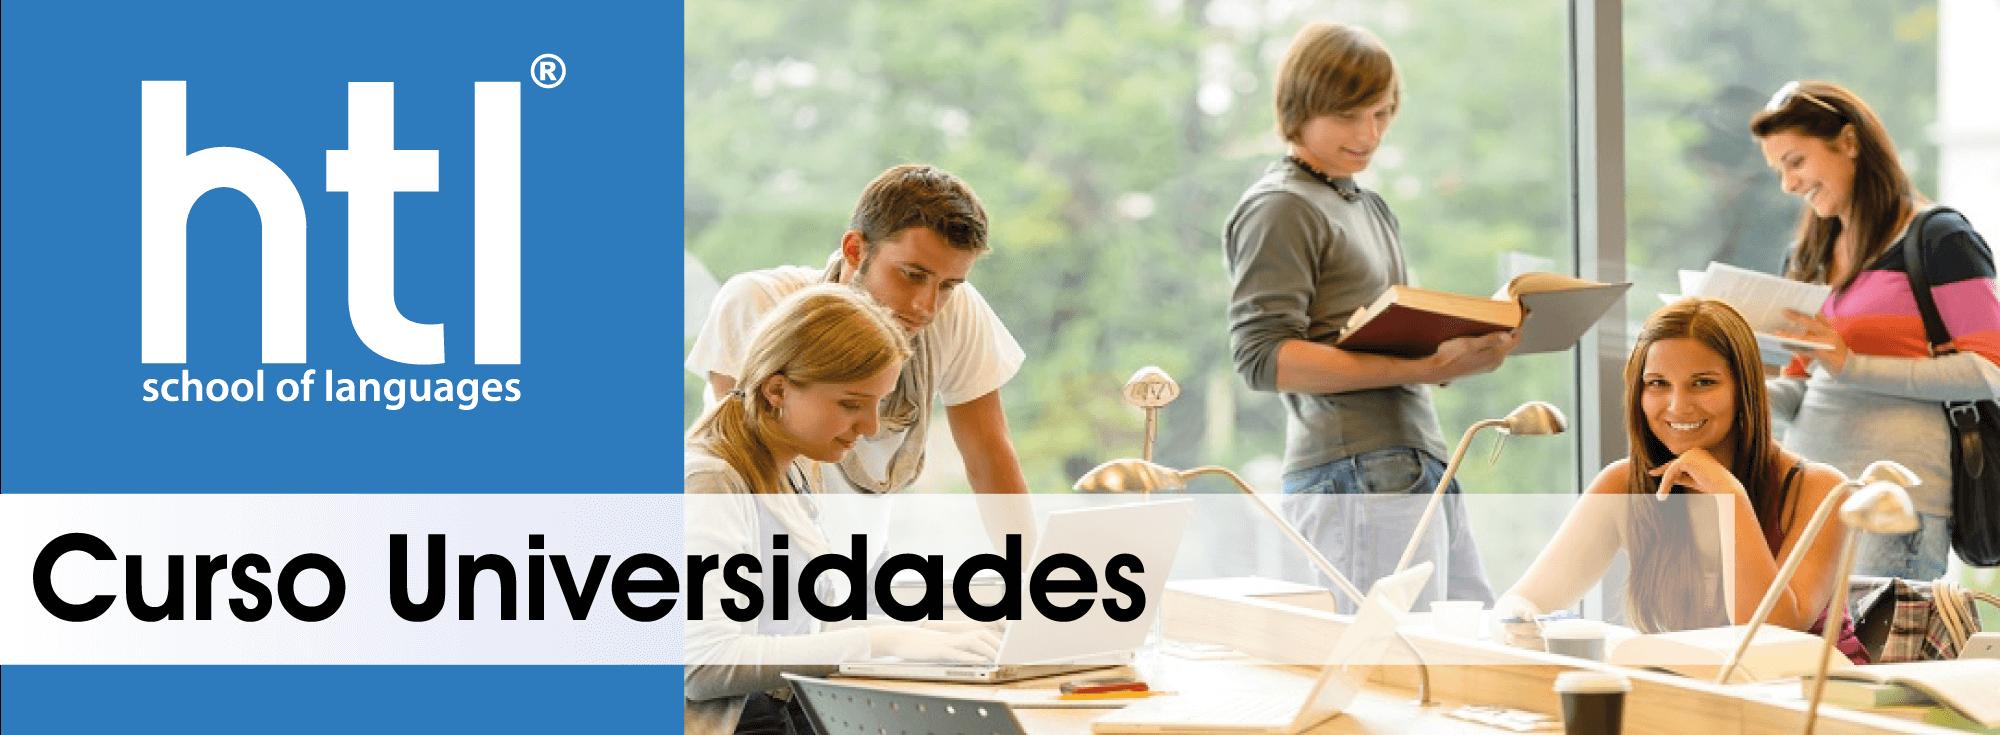 Curso universidades Idiomas Htlidiomas